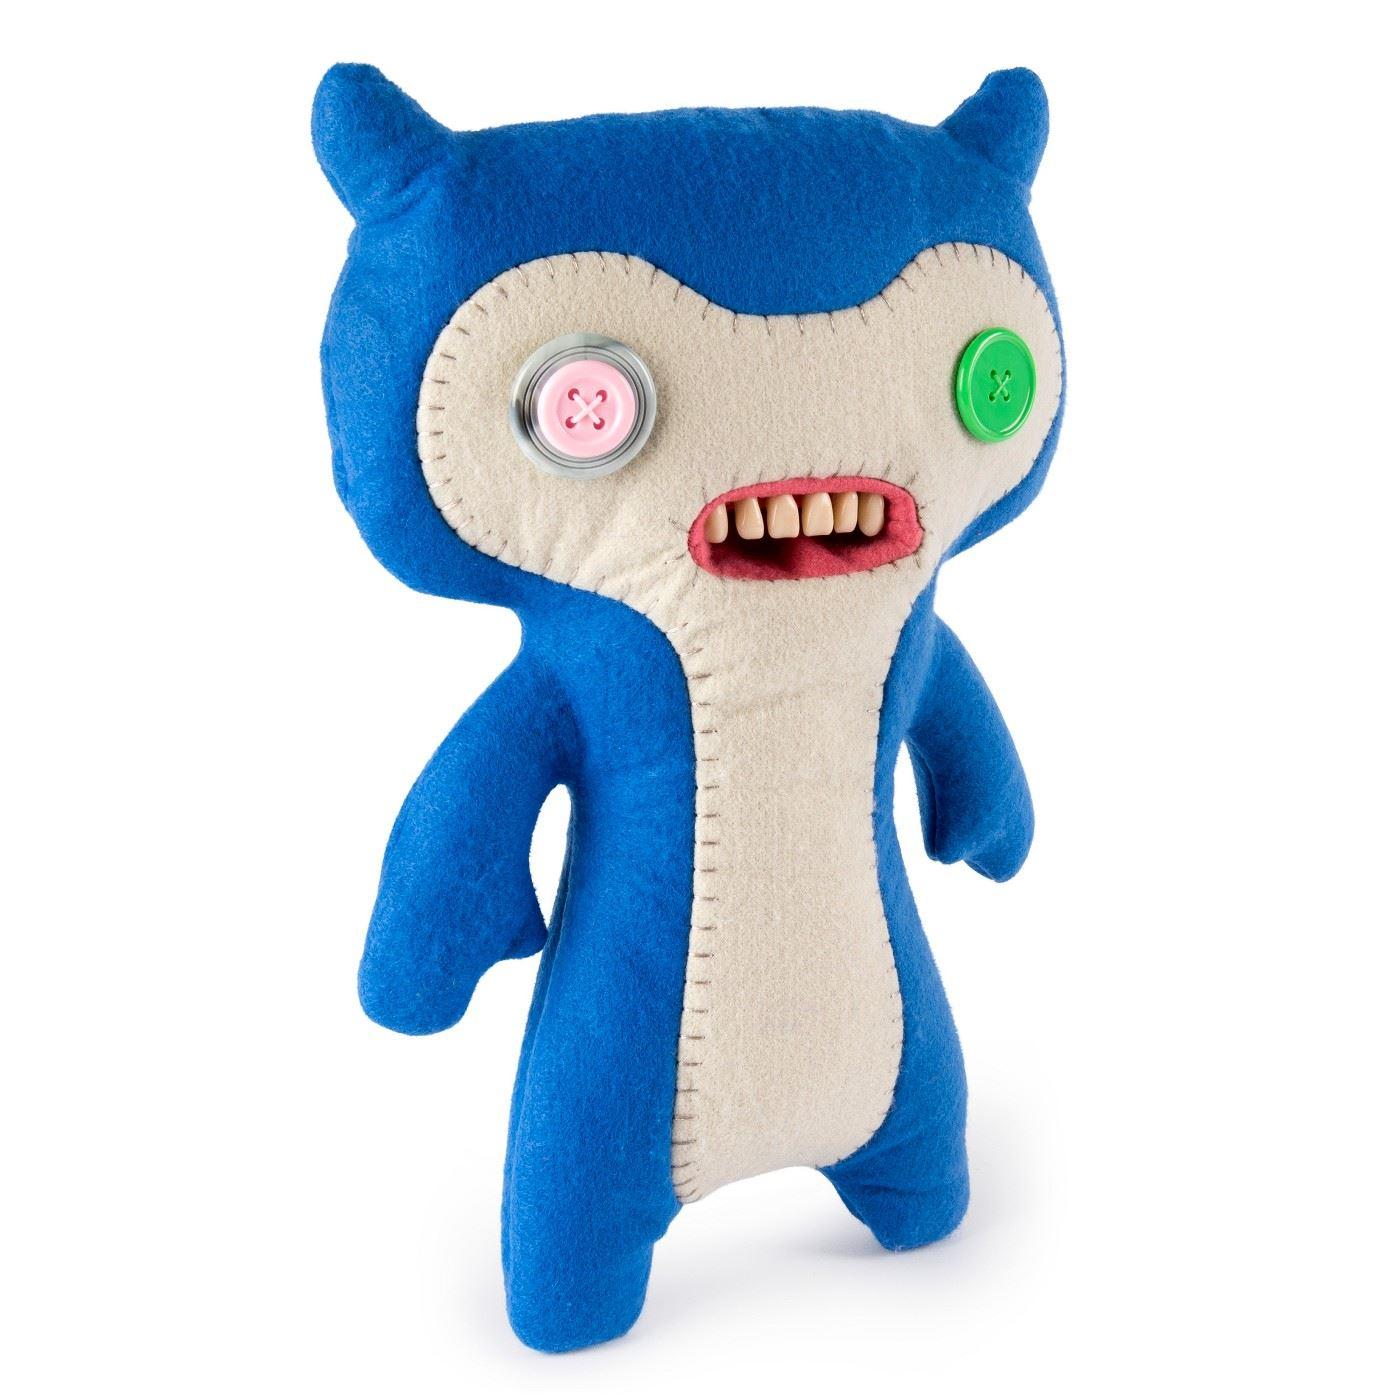 Fuggler-Funny-Uggly-Monsters-Blue-Red-Purple-Light-Red-Stuffed-Animal 縮圖 5